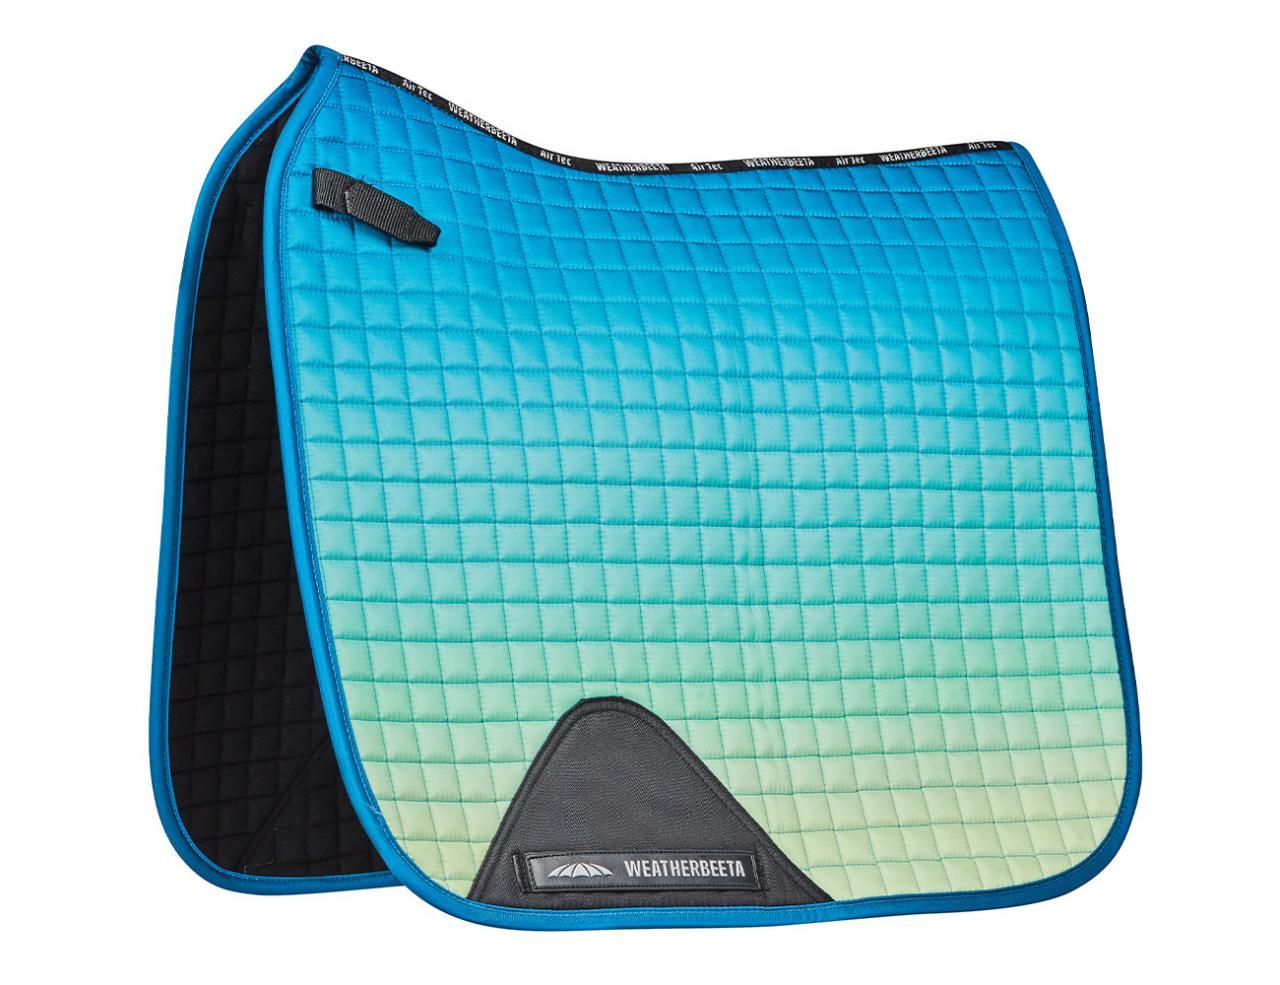 OCEANSREEF-Prime-Ombre-Dressage saddle pad